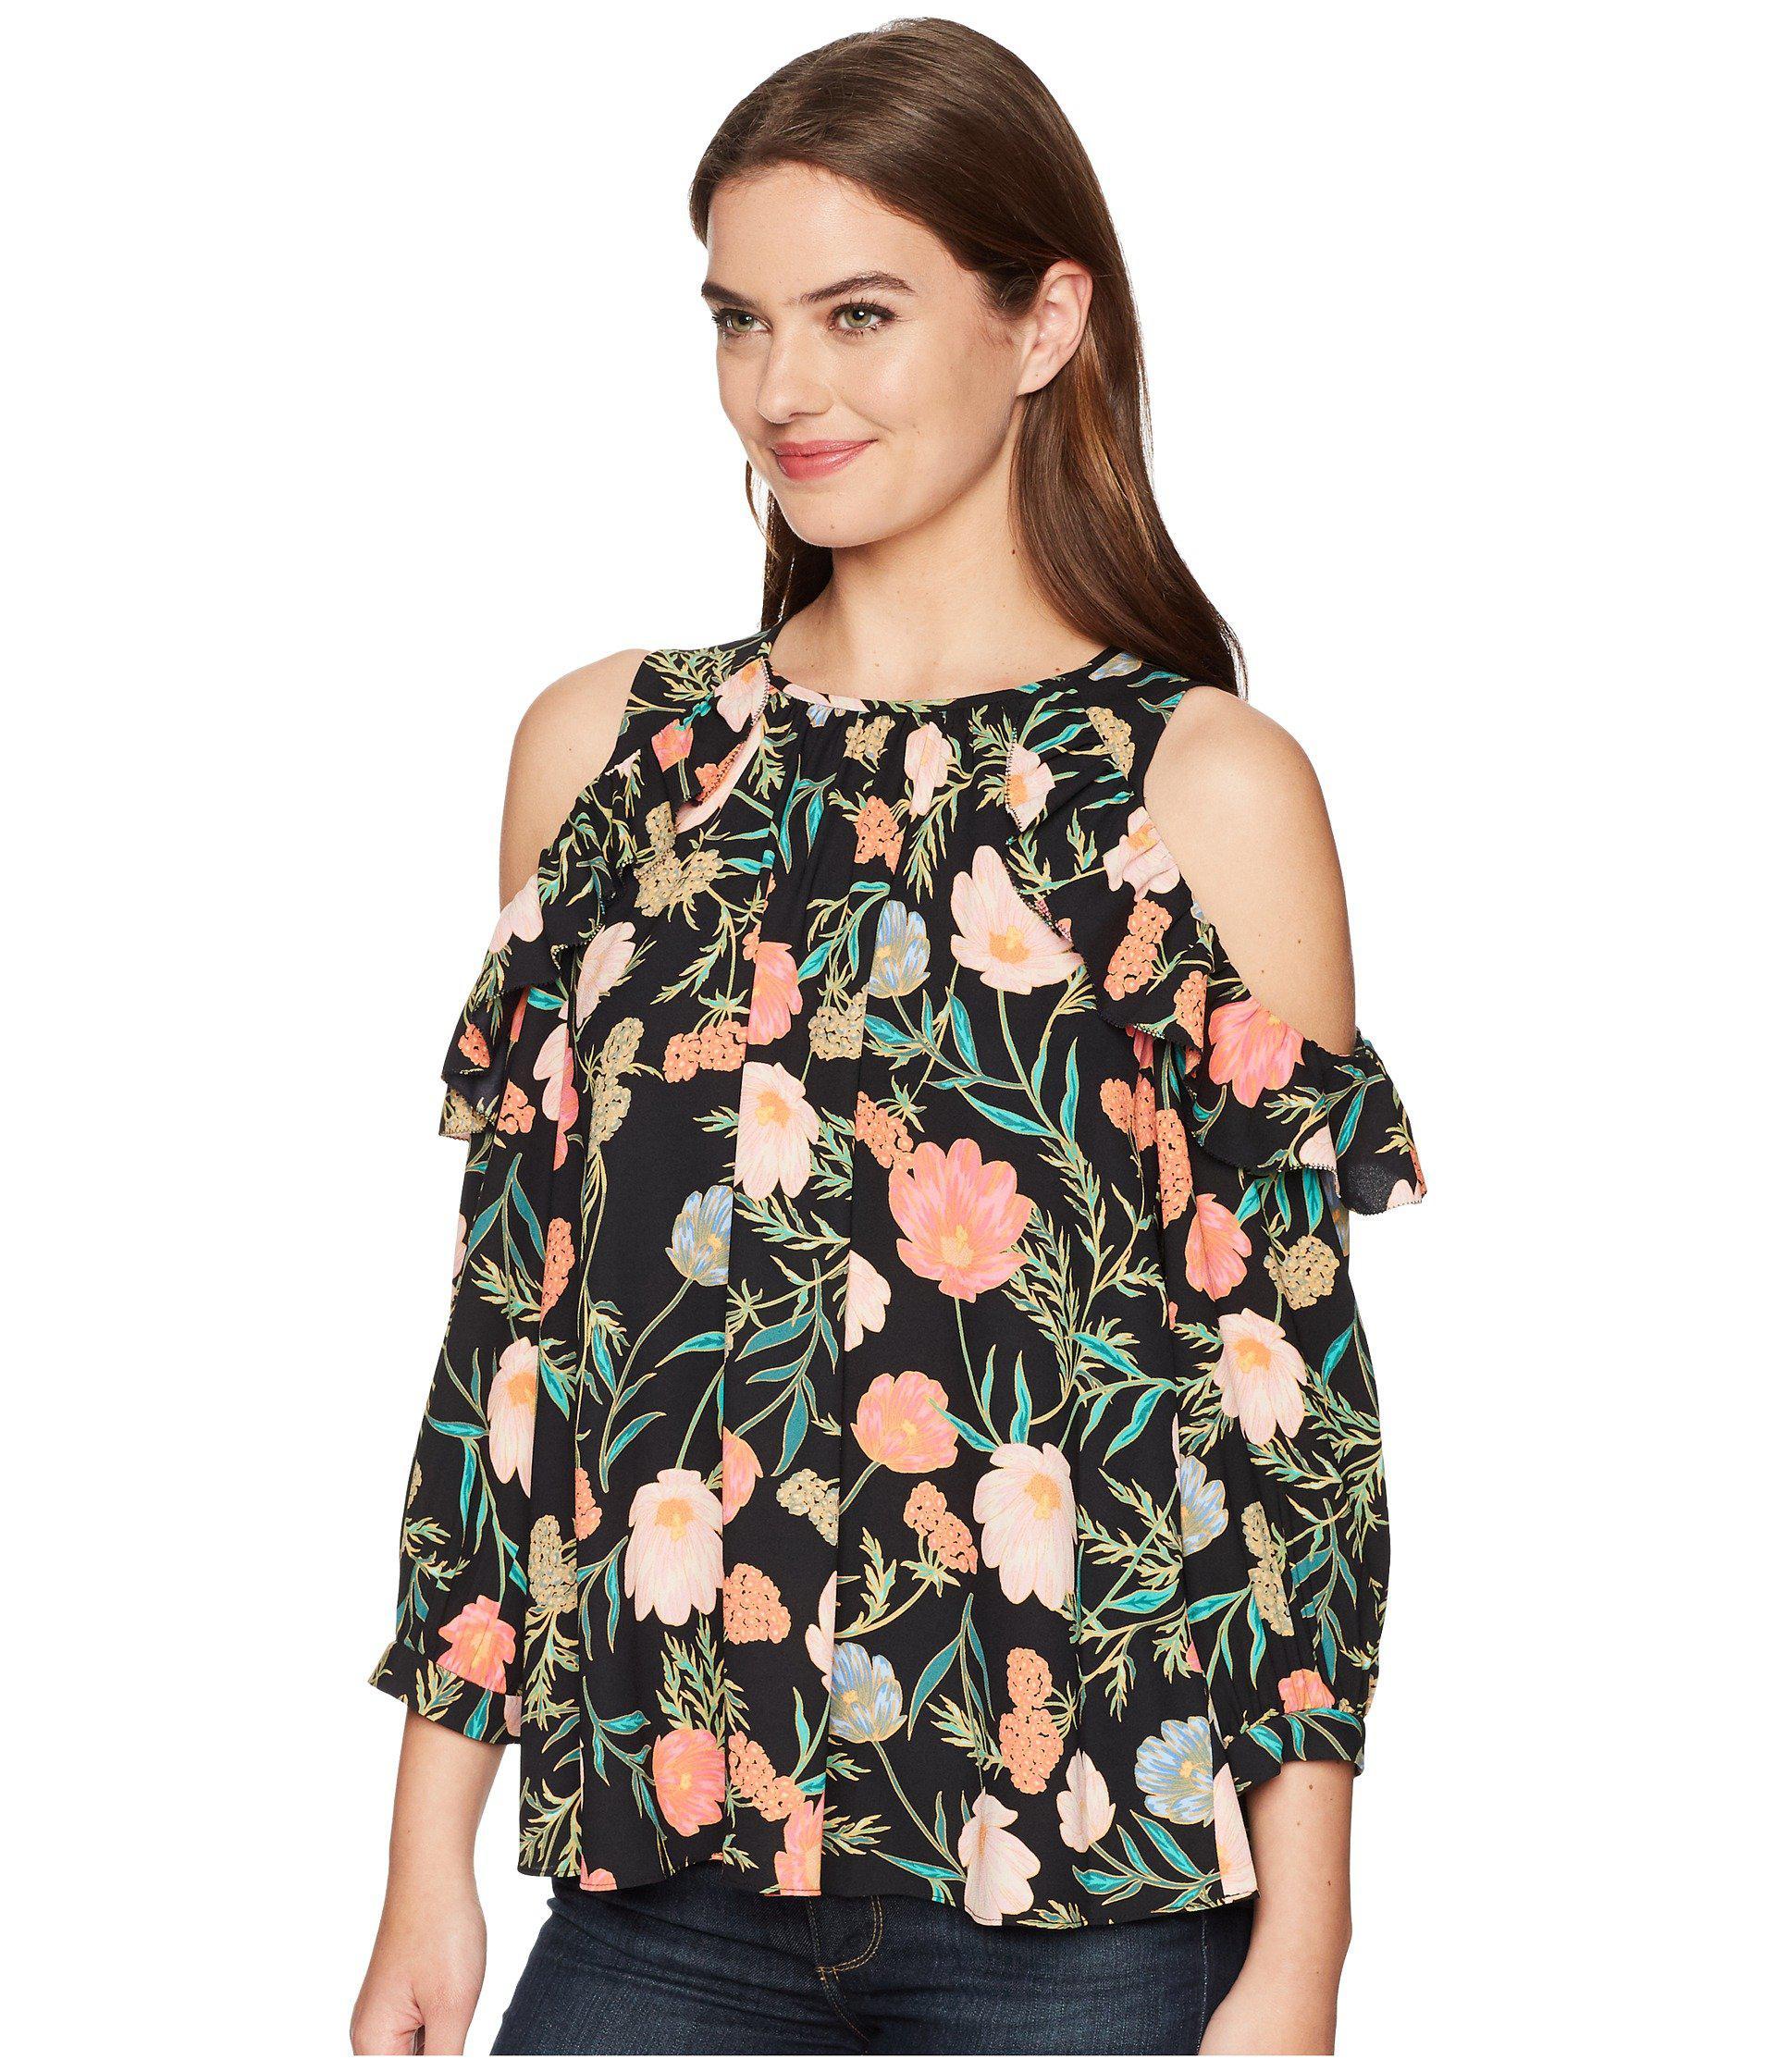 216c77fd463 Kate Spade - Black Blossom Cold Shoulder Top - Lyst. View fullscreen